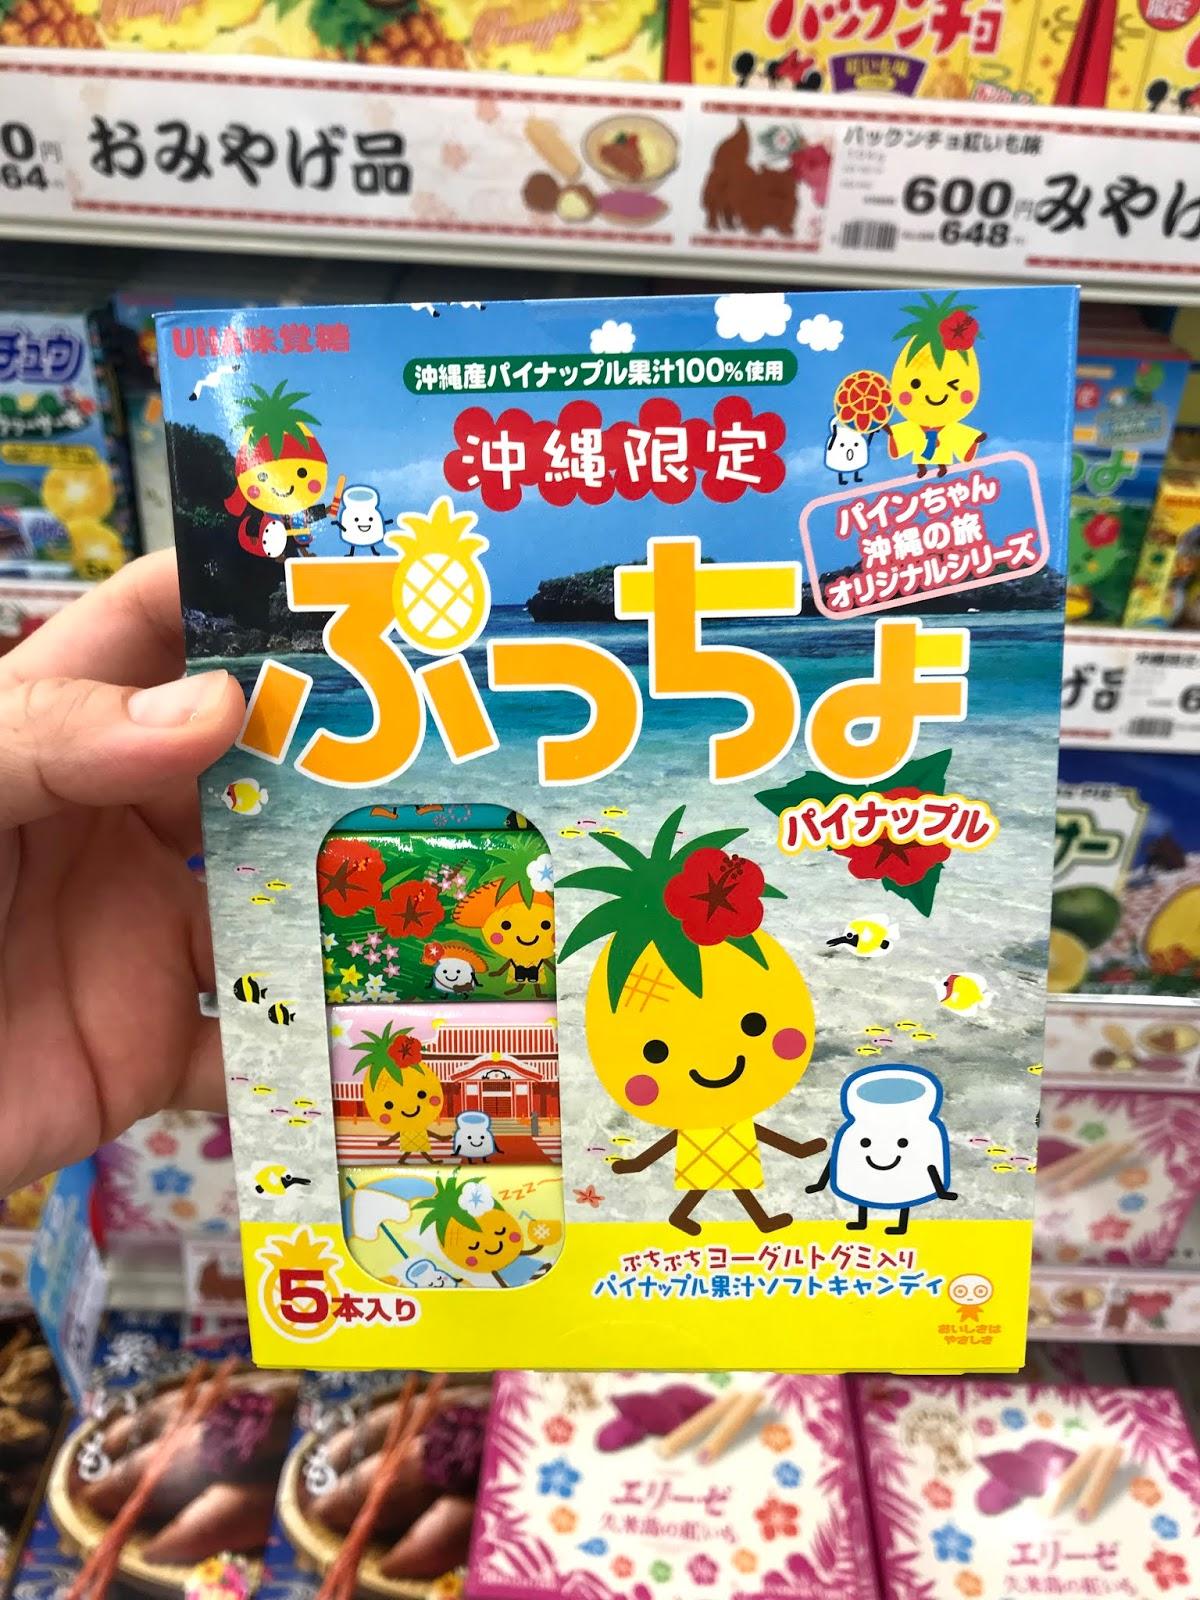 Top-9-Things-To-Do-In-Ishigaki-Okinawa-Japan